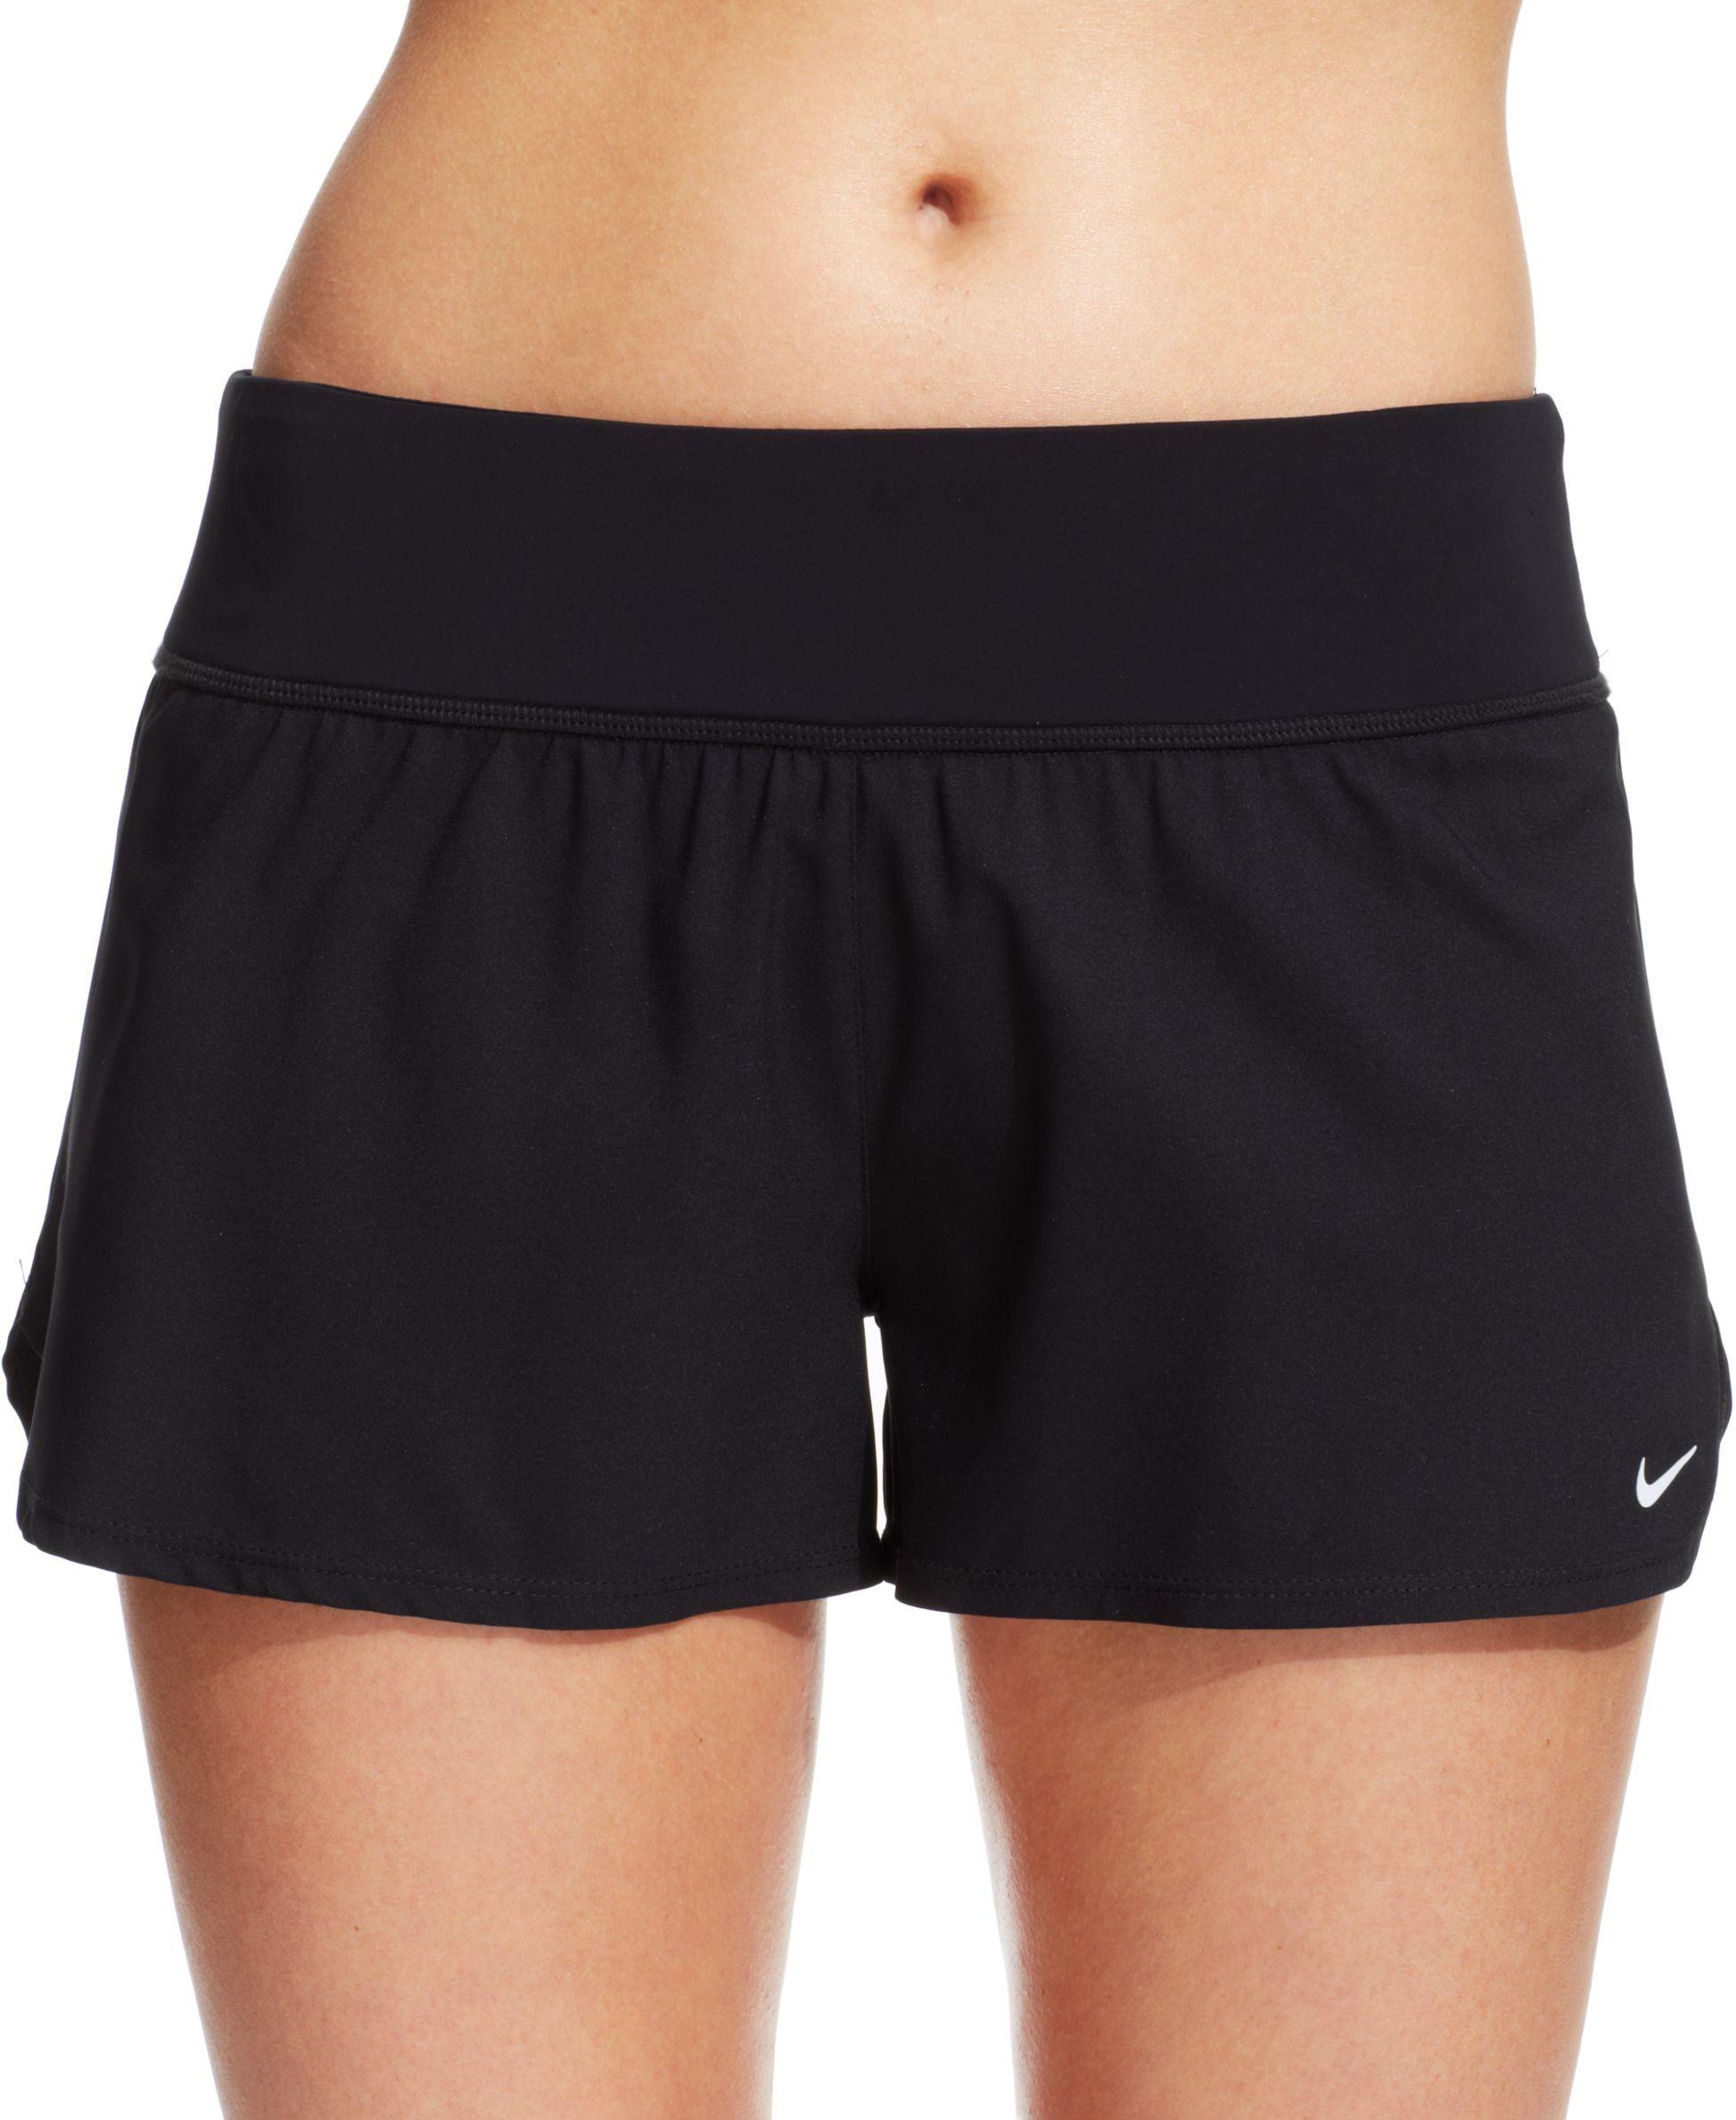 81e1d768bd Nike Swoosh Active Board Shorts | Products | Board shorts women ...